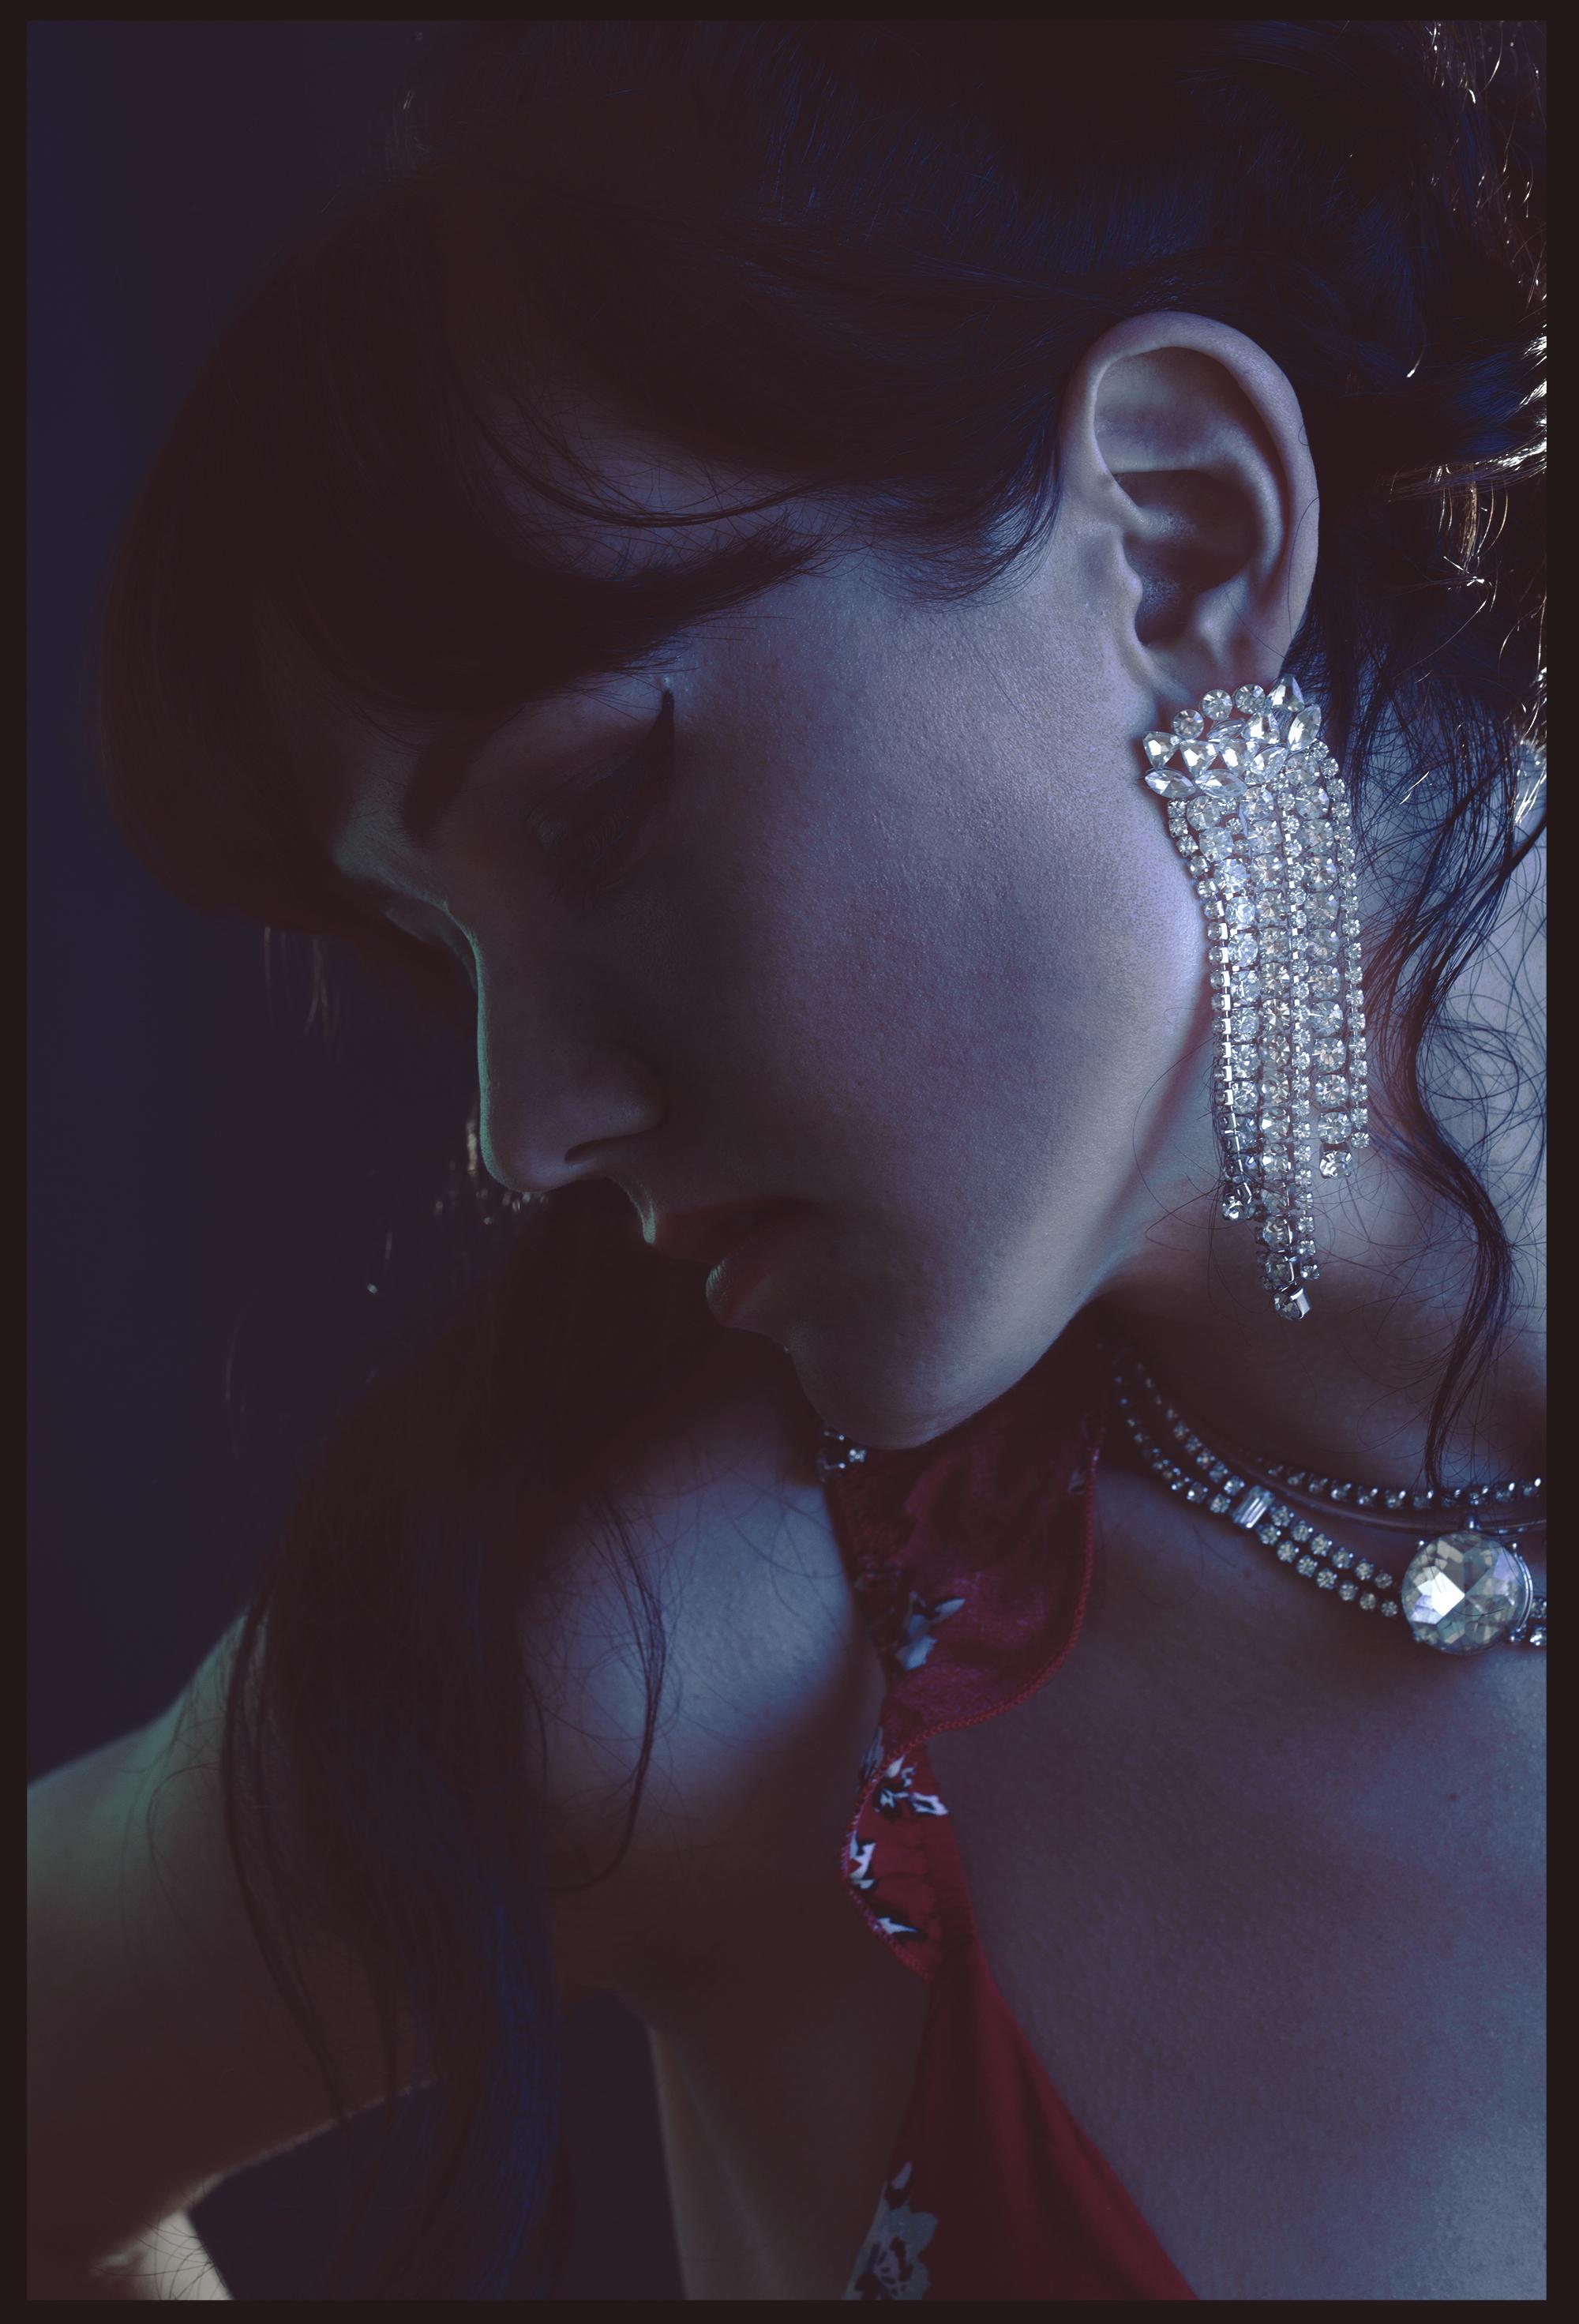 Elle_Cinematic_Portrait_01.jpg